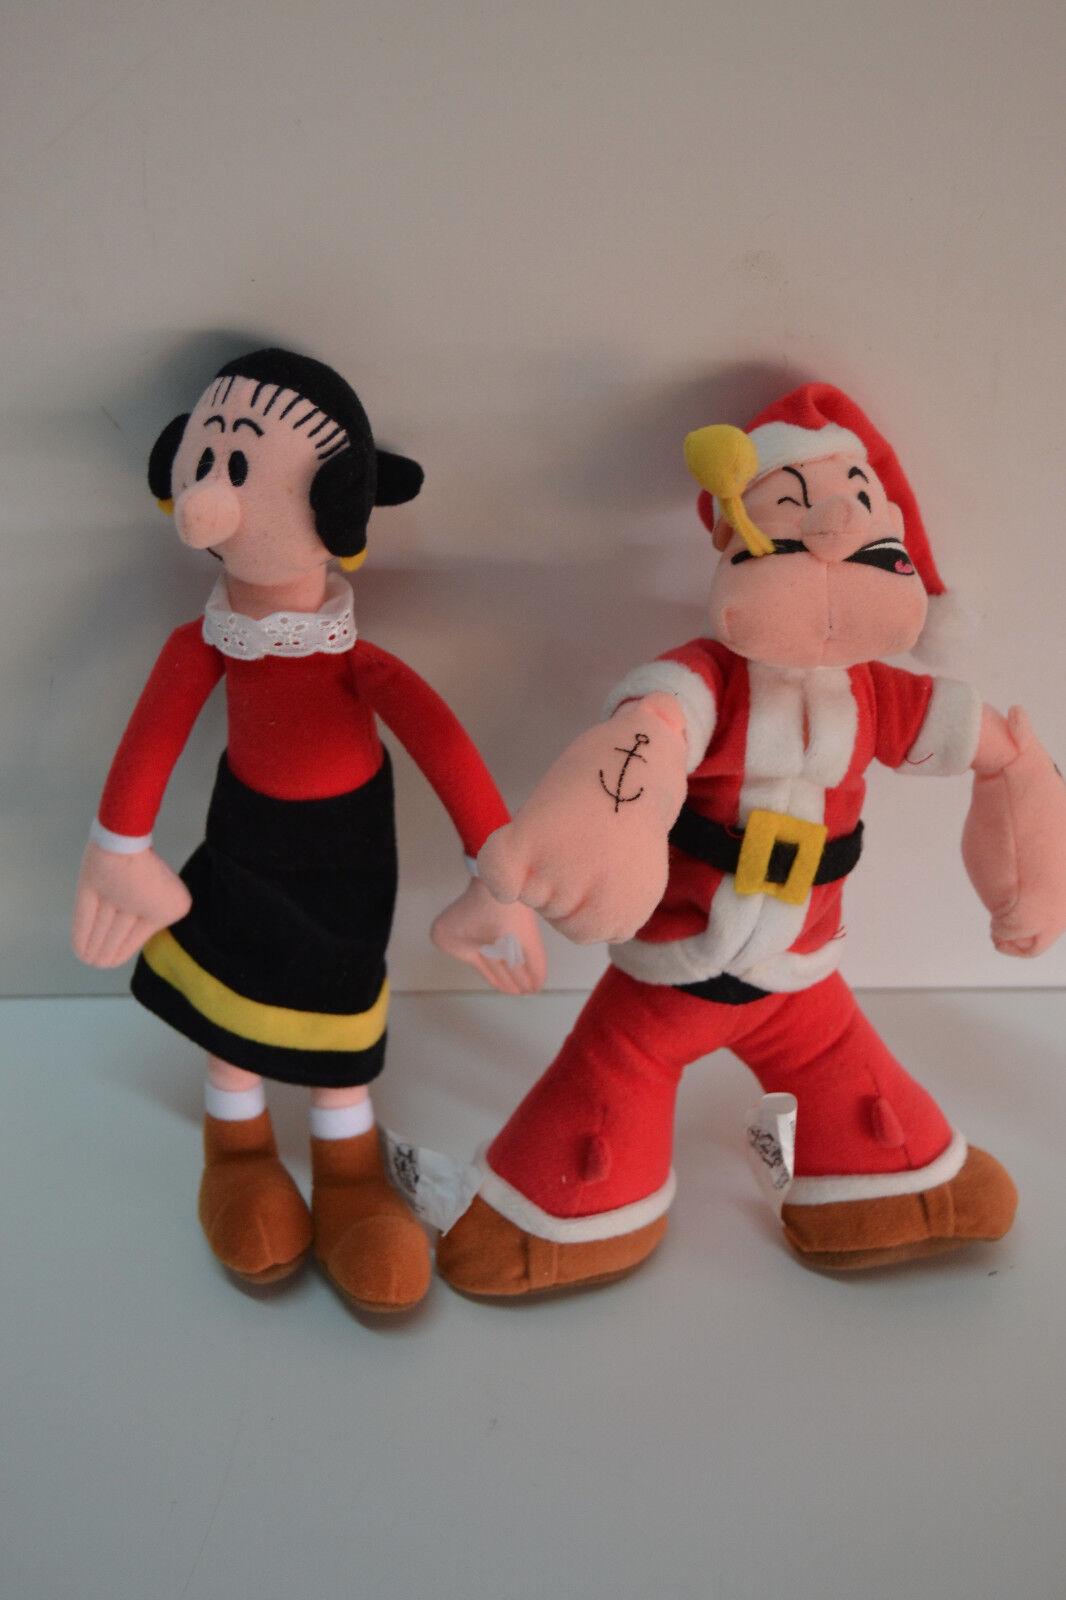 Pareja de peluches Popeye y Olivia - Play by Play